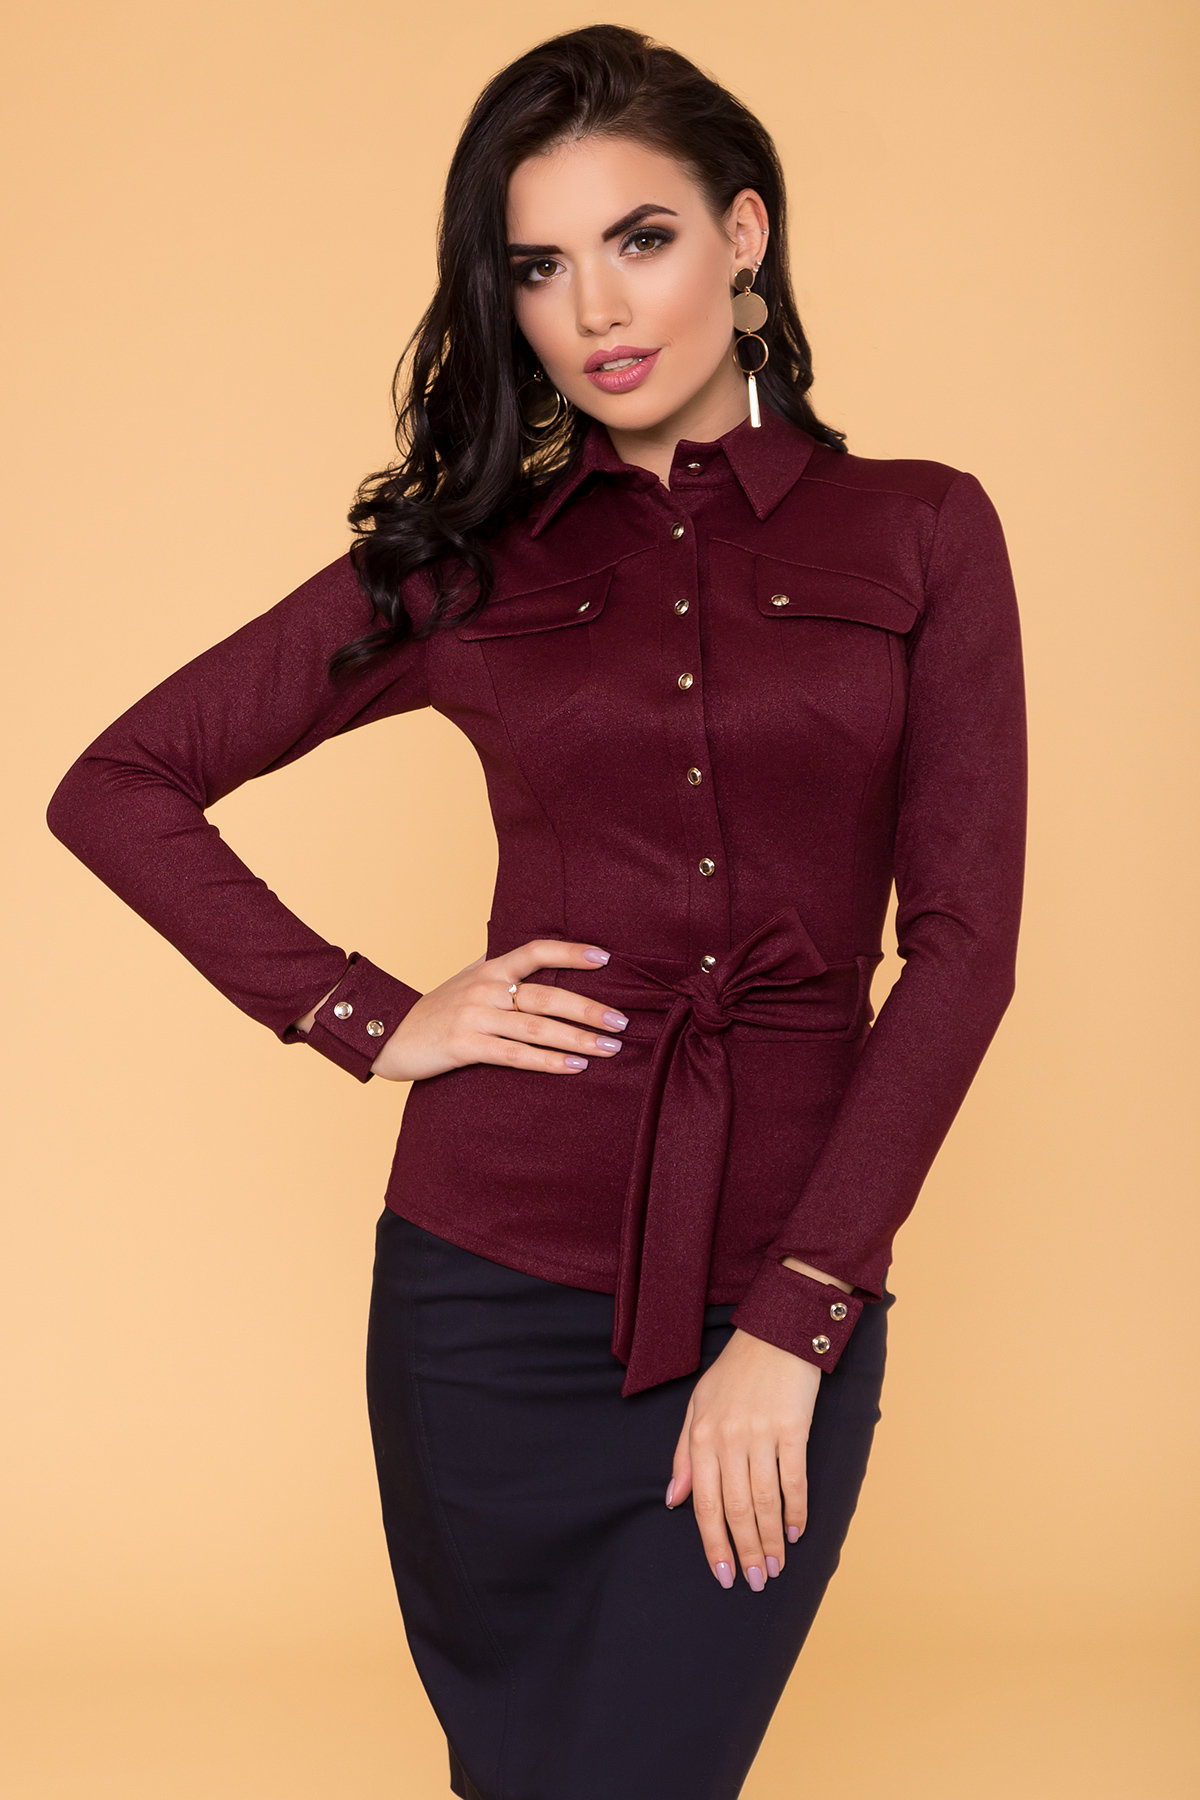 Рубашка Соня 6116 Цвет: Марсала